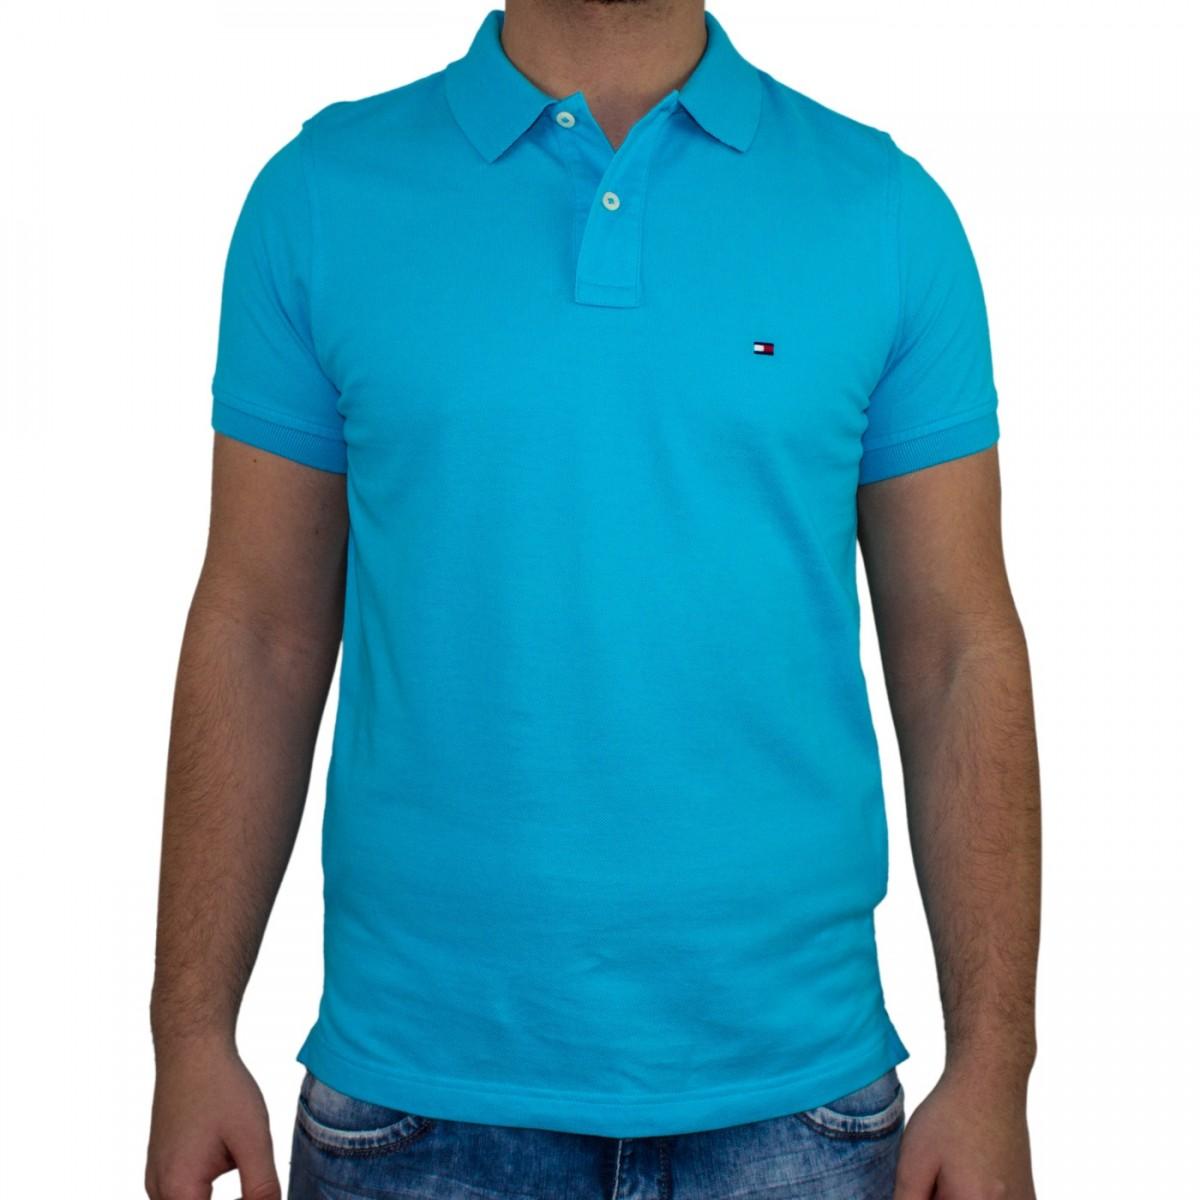 Bizz Store - Camisa Polo Masculina Tommy Hilfiger Slim Manga Curta 8d9616d6cebf4